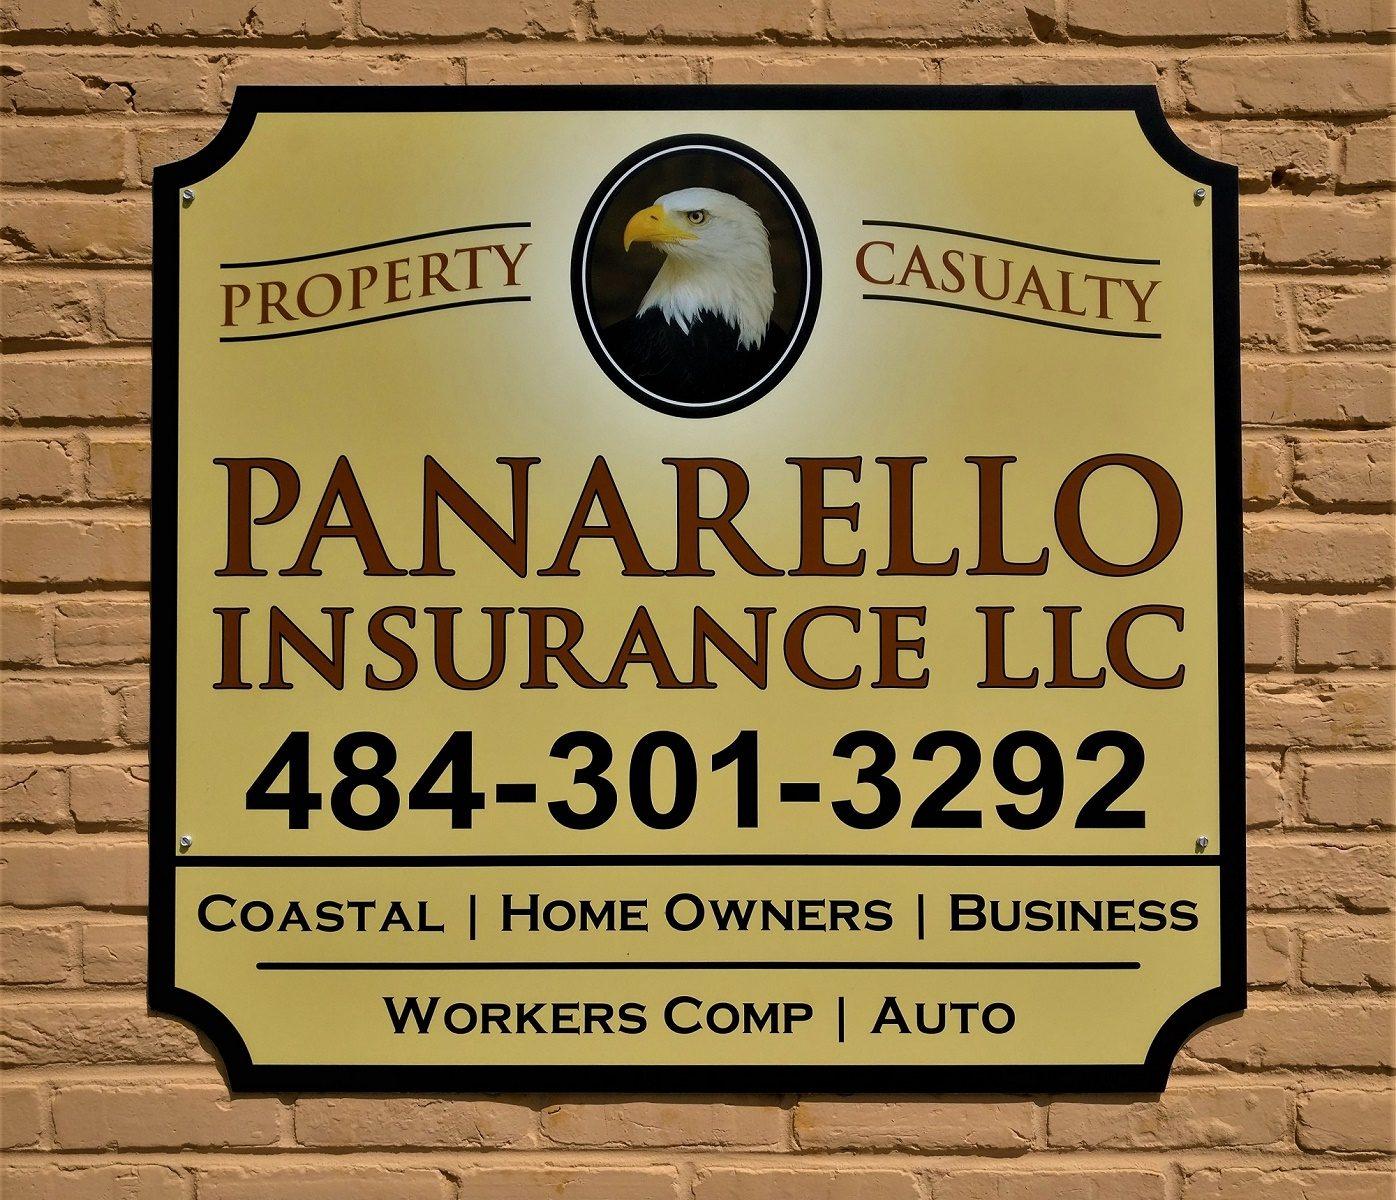 Panarello Insurance LLC